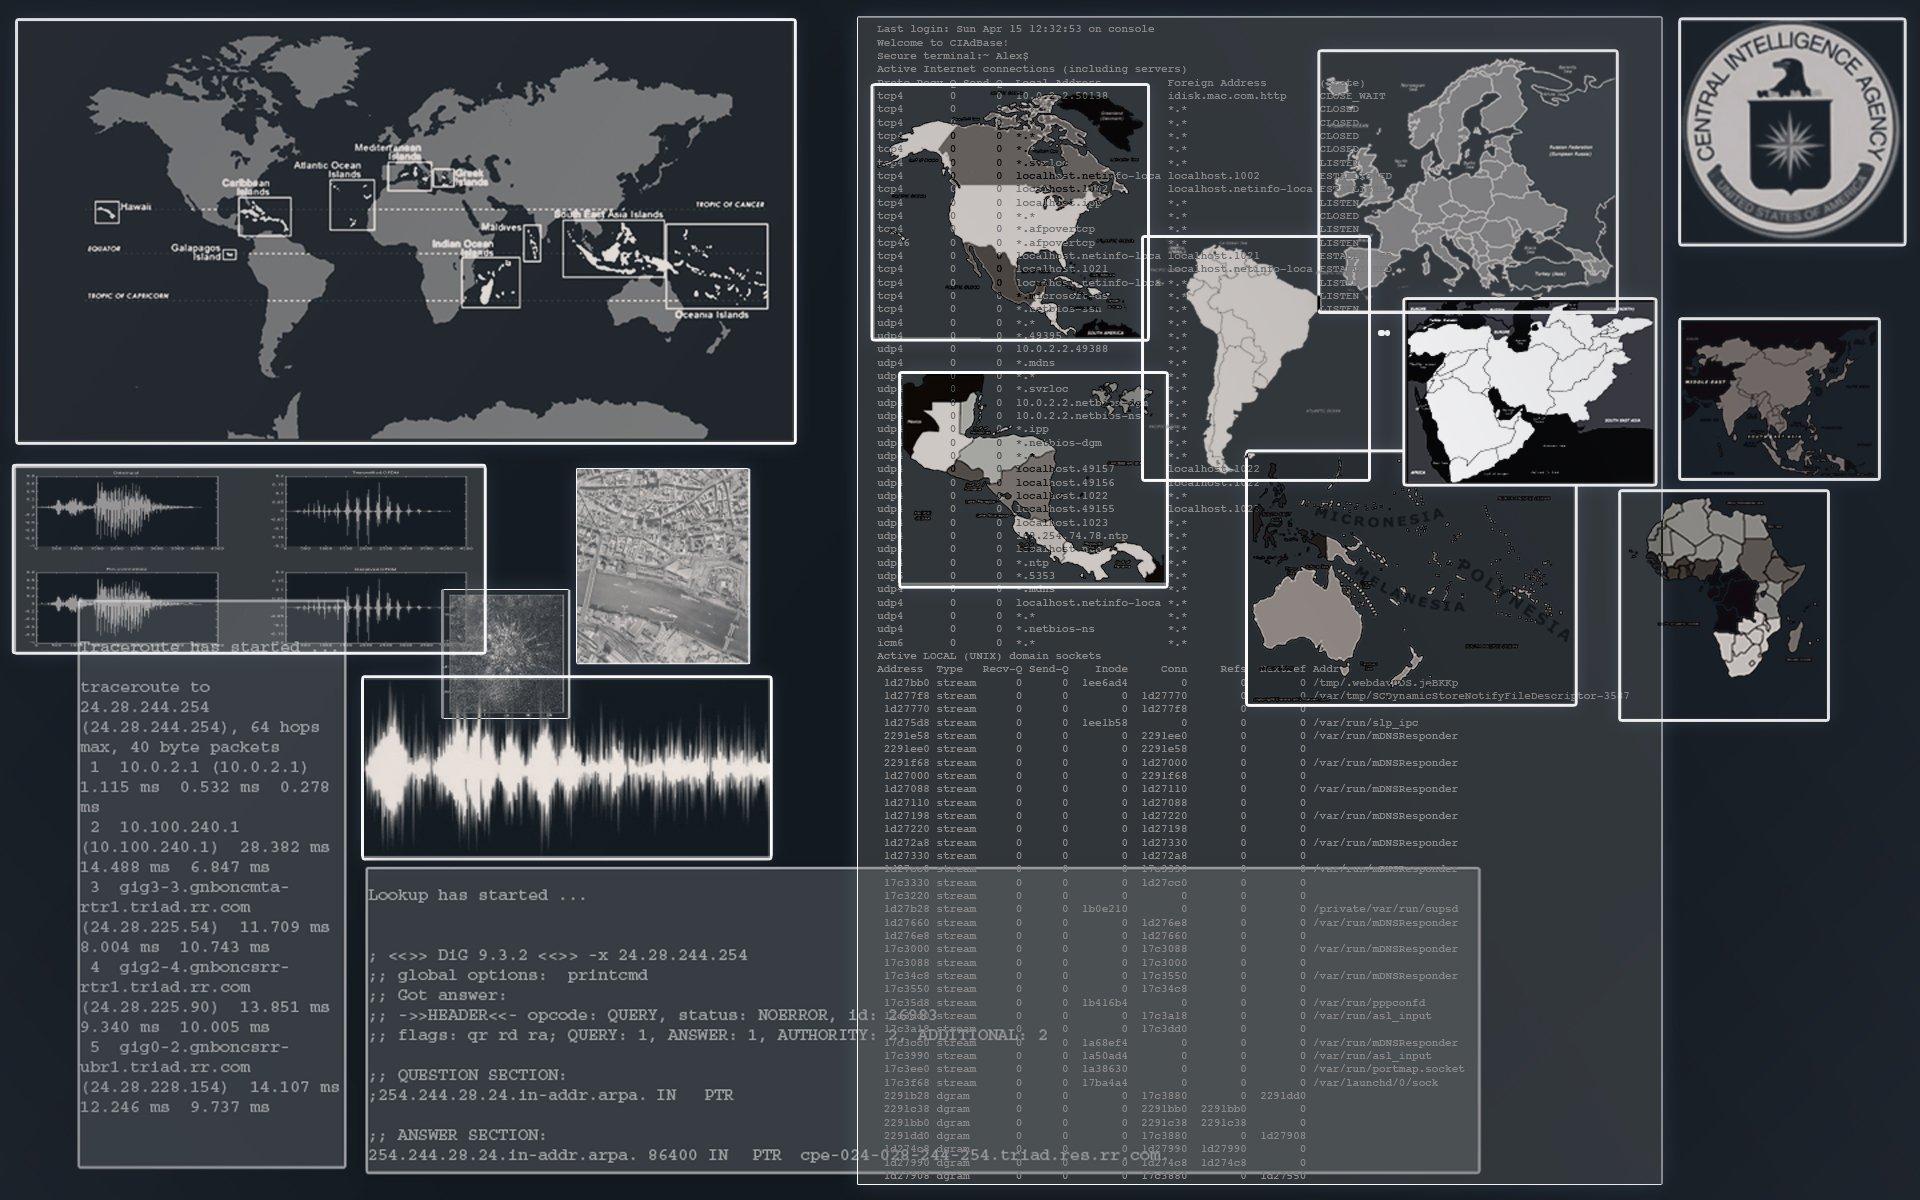 CIA Central Intelligence Agency crime usa america spy logo wallpaper 1920x1200